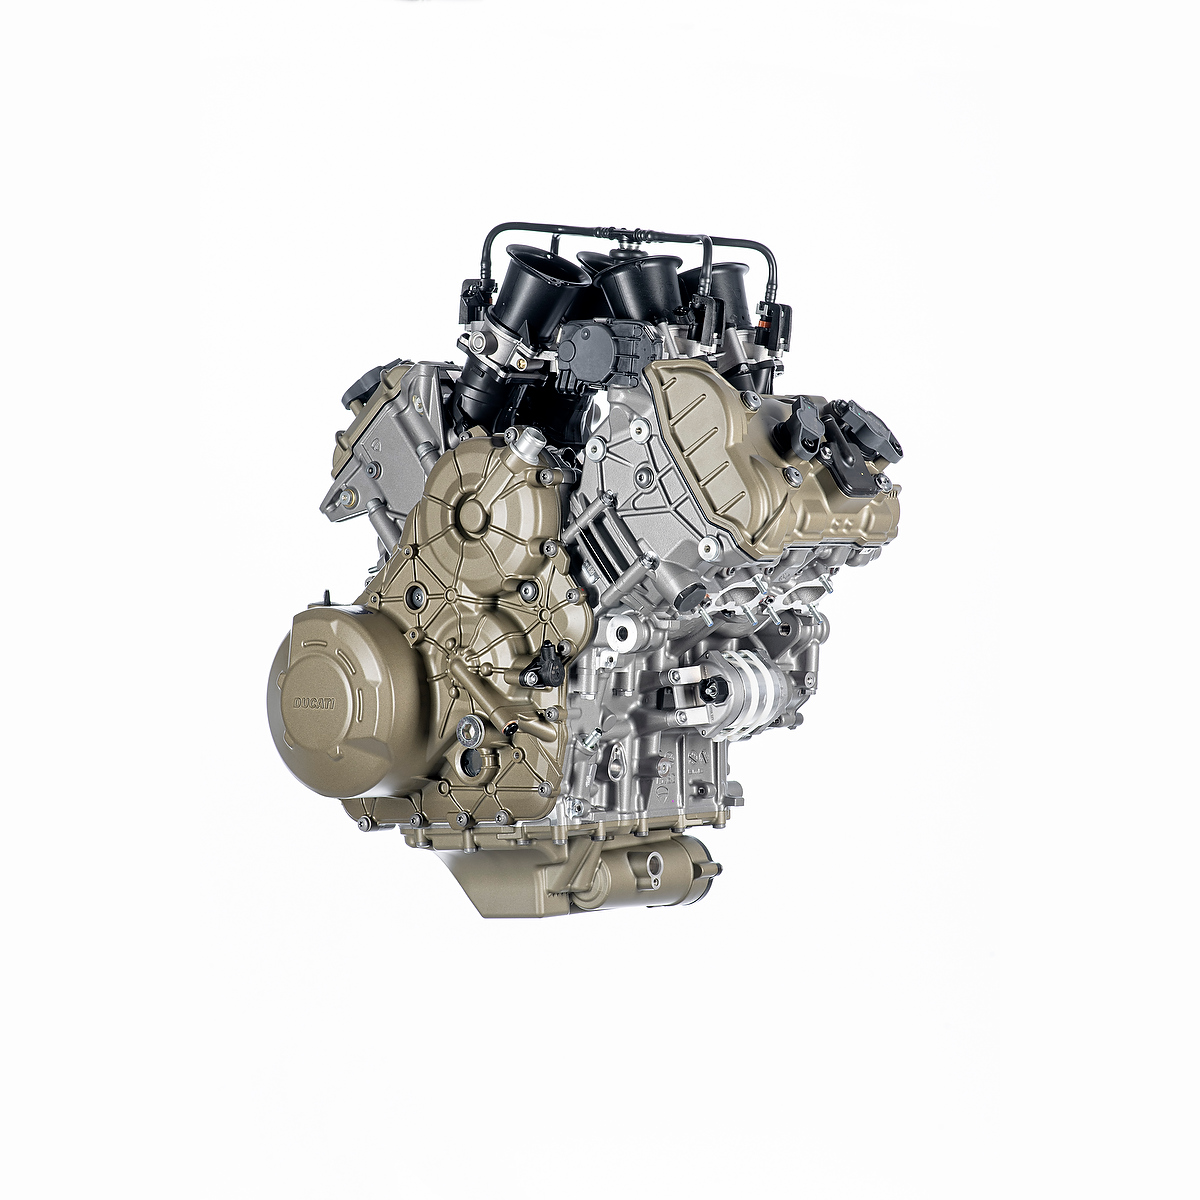 Motore Ducati V4 Granturismo_02_UC200241_High - Low res